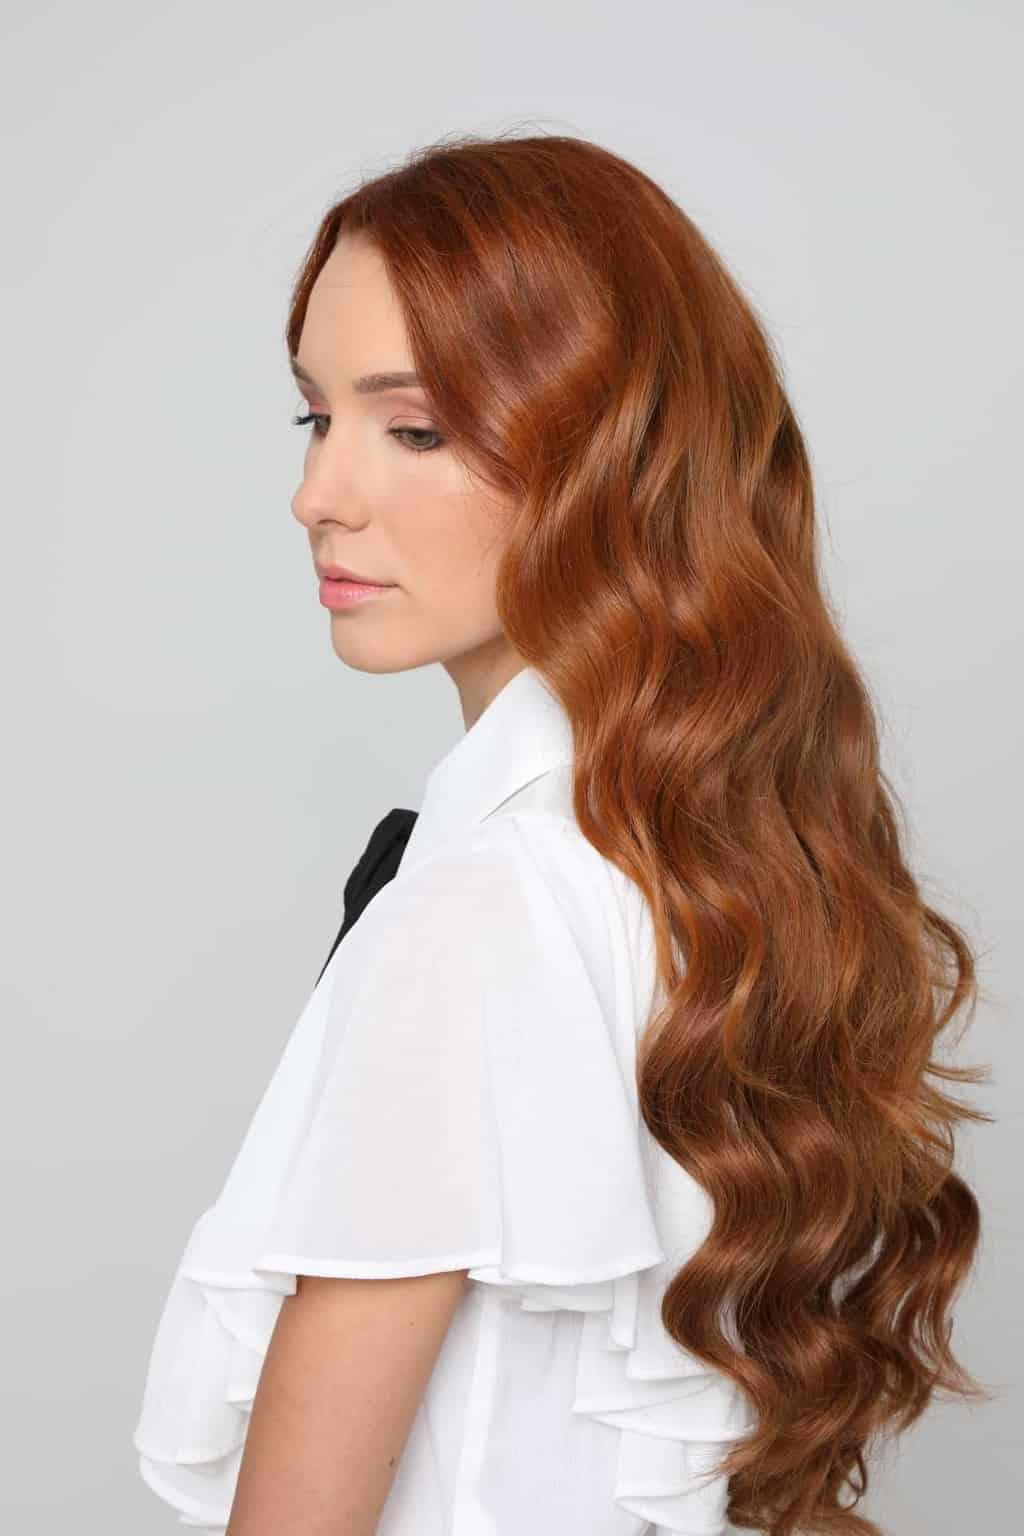 gyönyörű hullámos haj